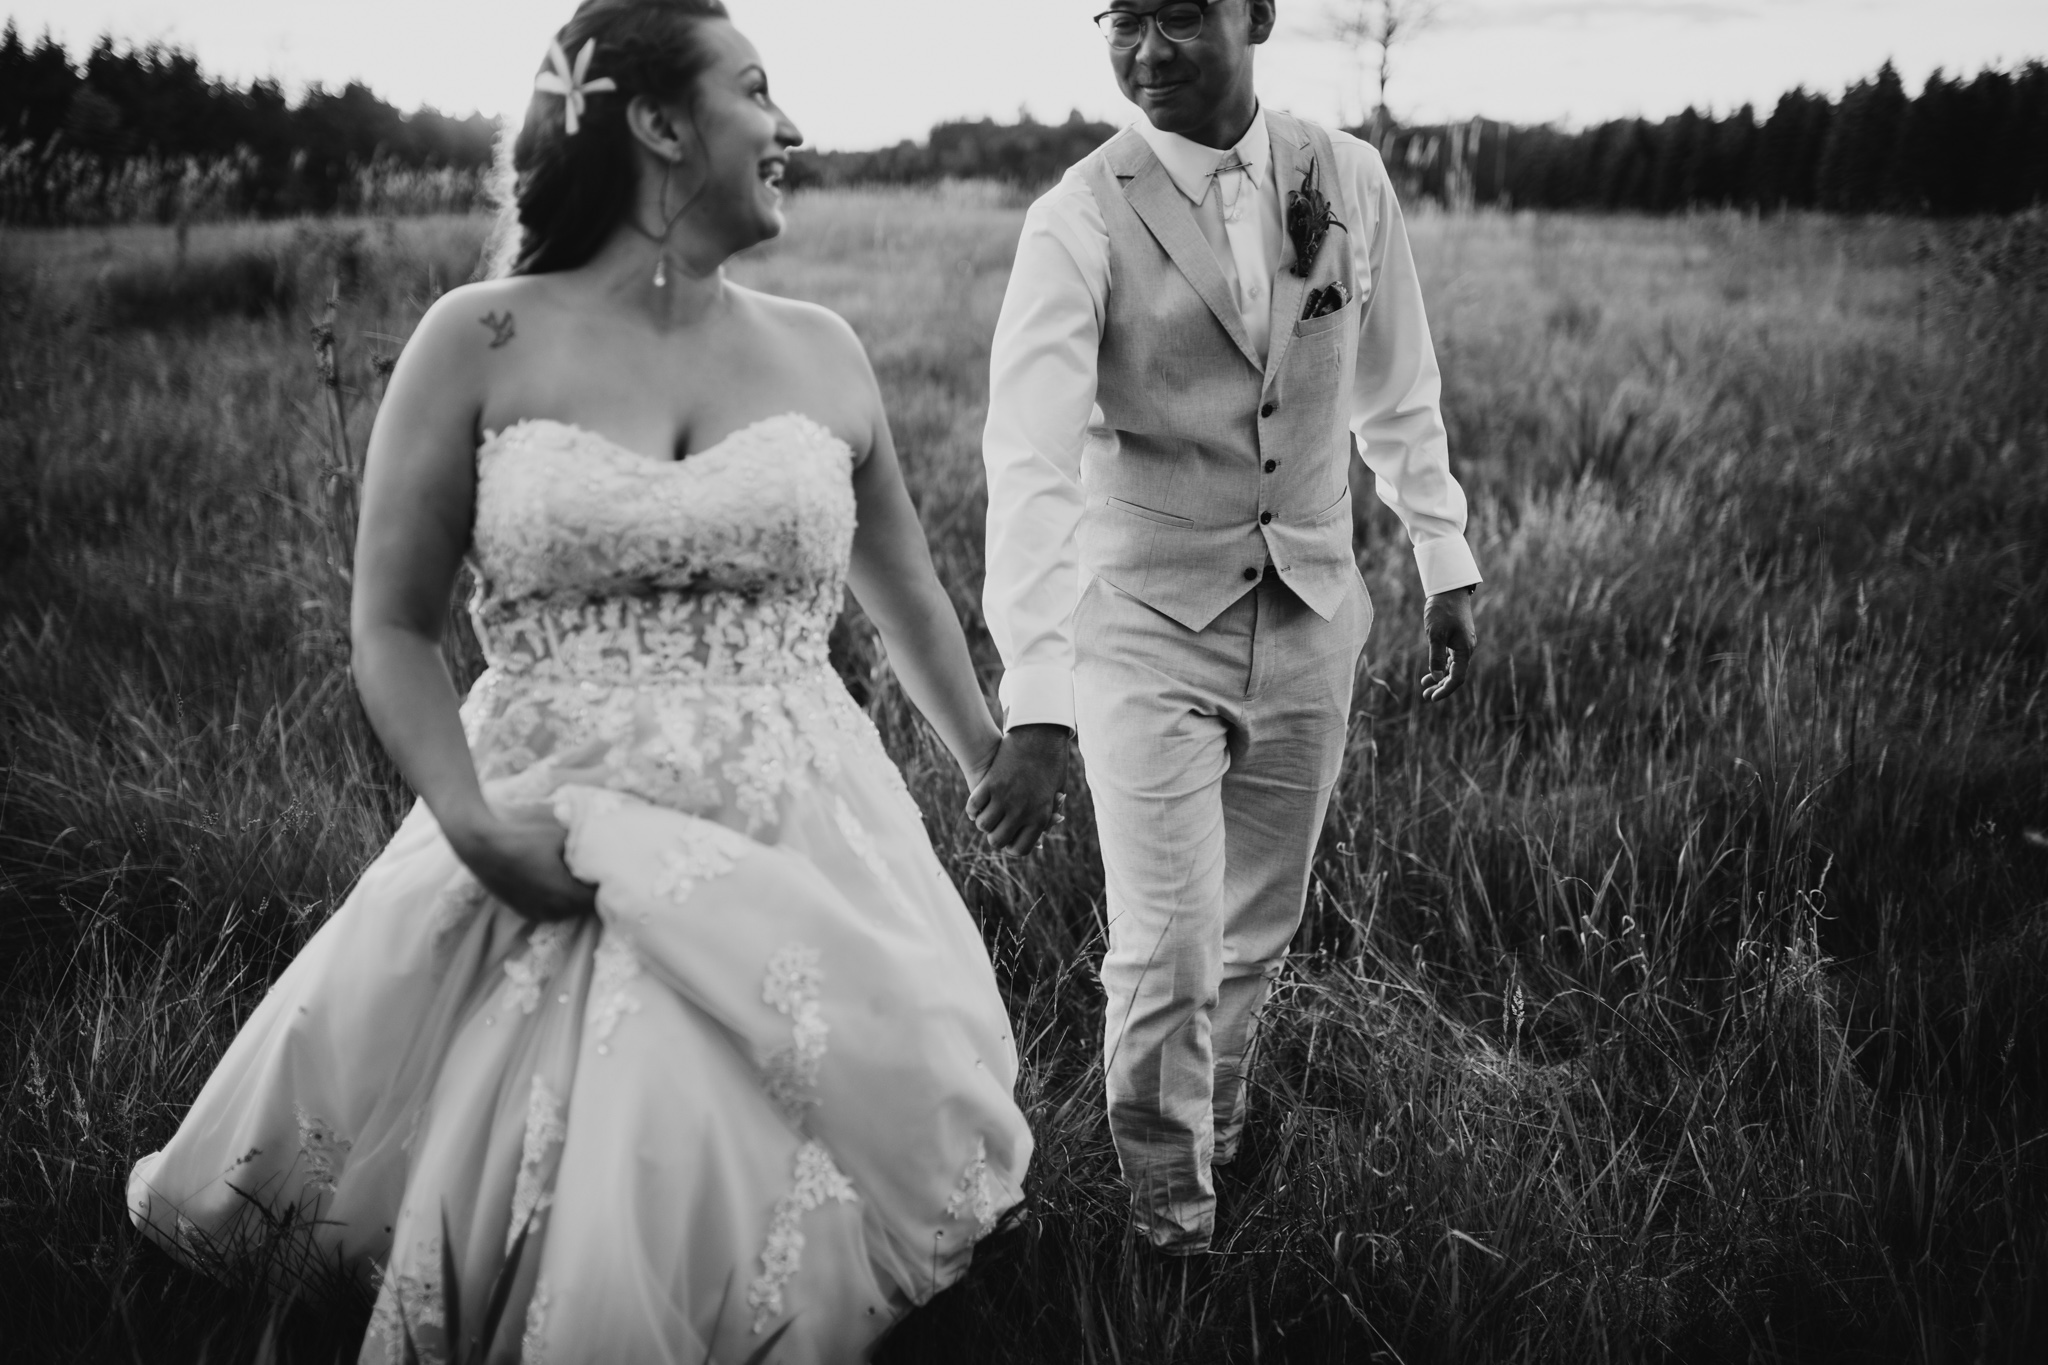 607-WEB-Jonathan-Kuhn-Photography-Winston-Marika-Wedding-9753.jpg